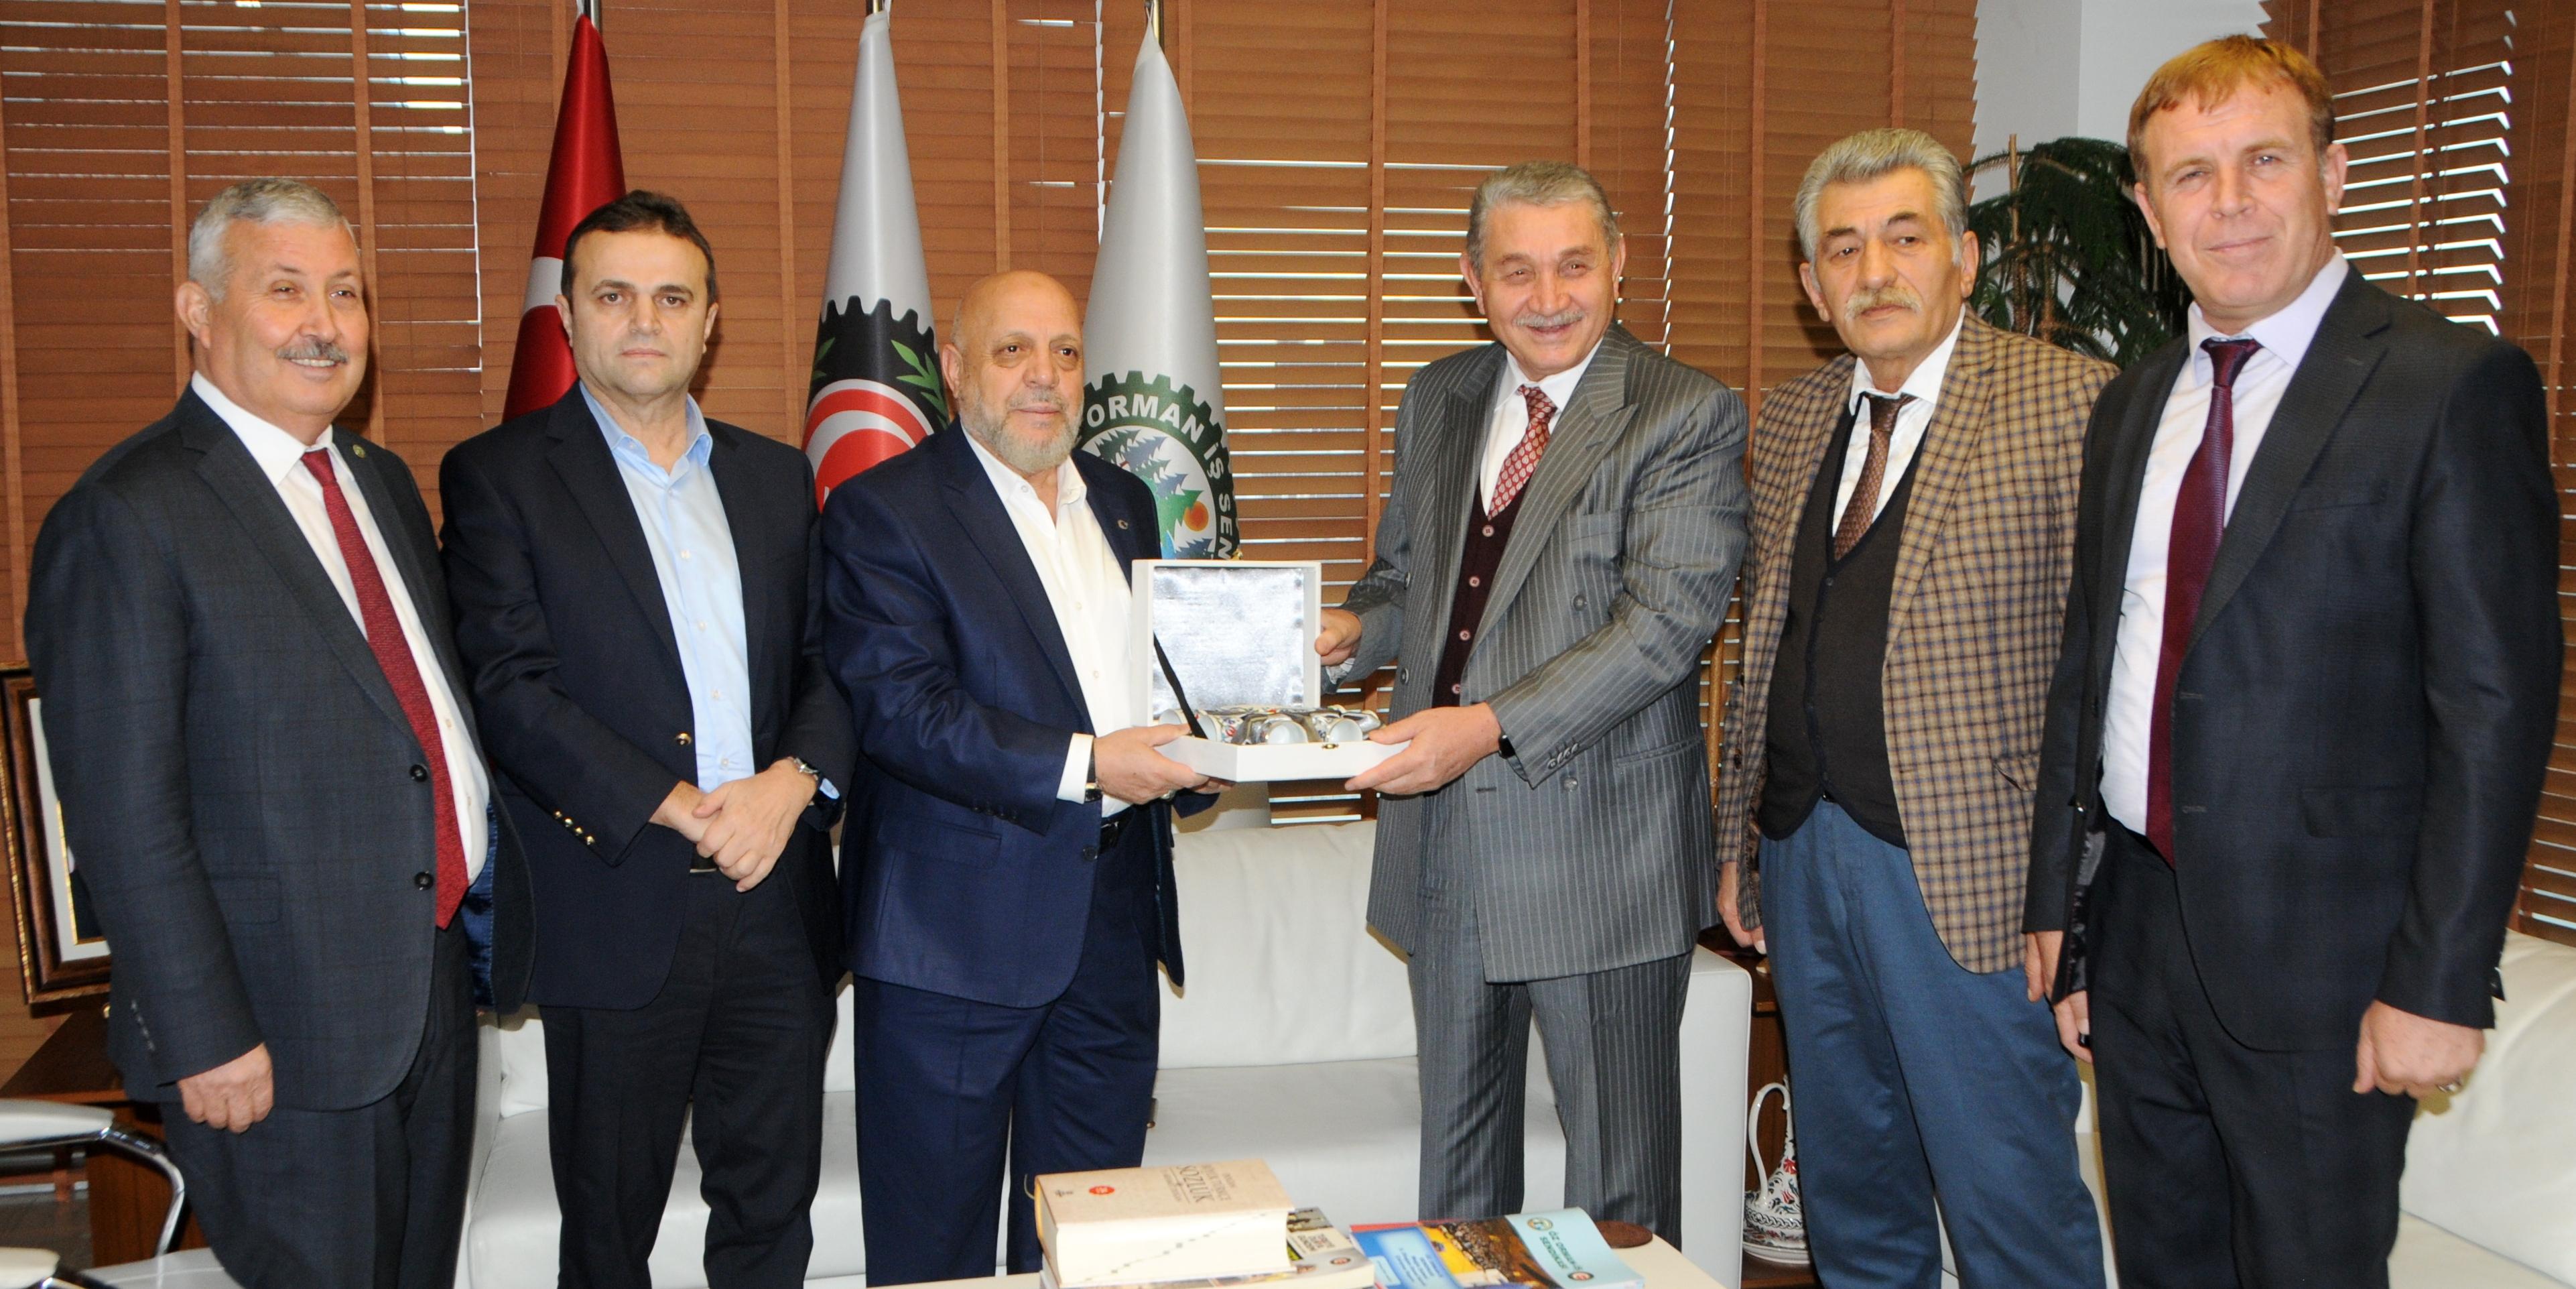 HAK-İŞ GENEL BAŞKANI ARSLAN ÖZ ORMAN-İŞ'İ ZİYARET ETTİ